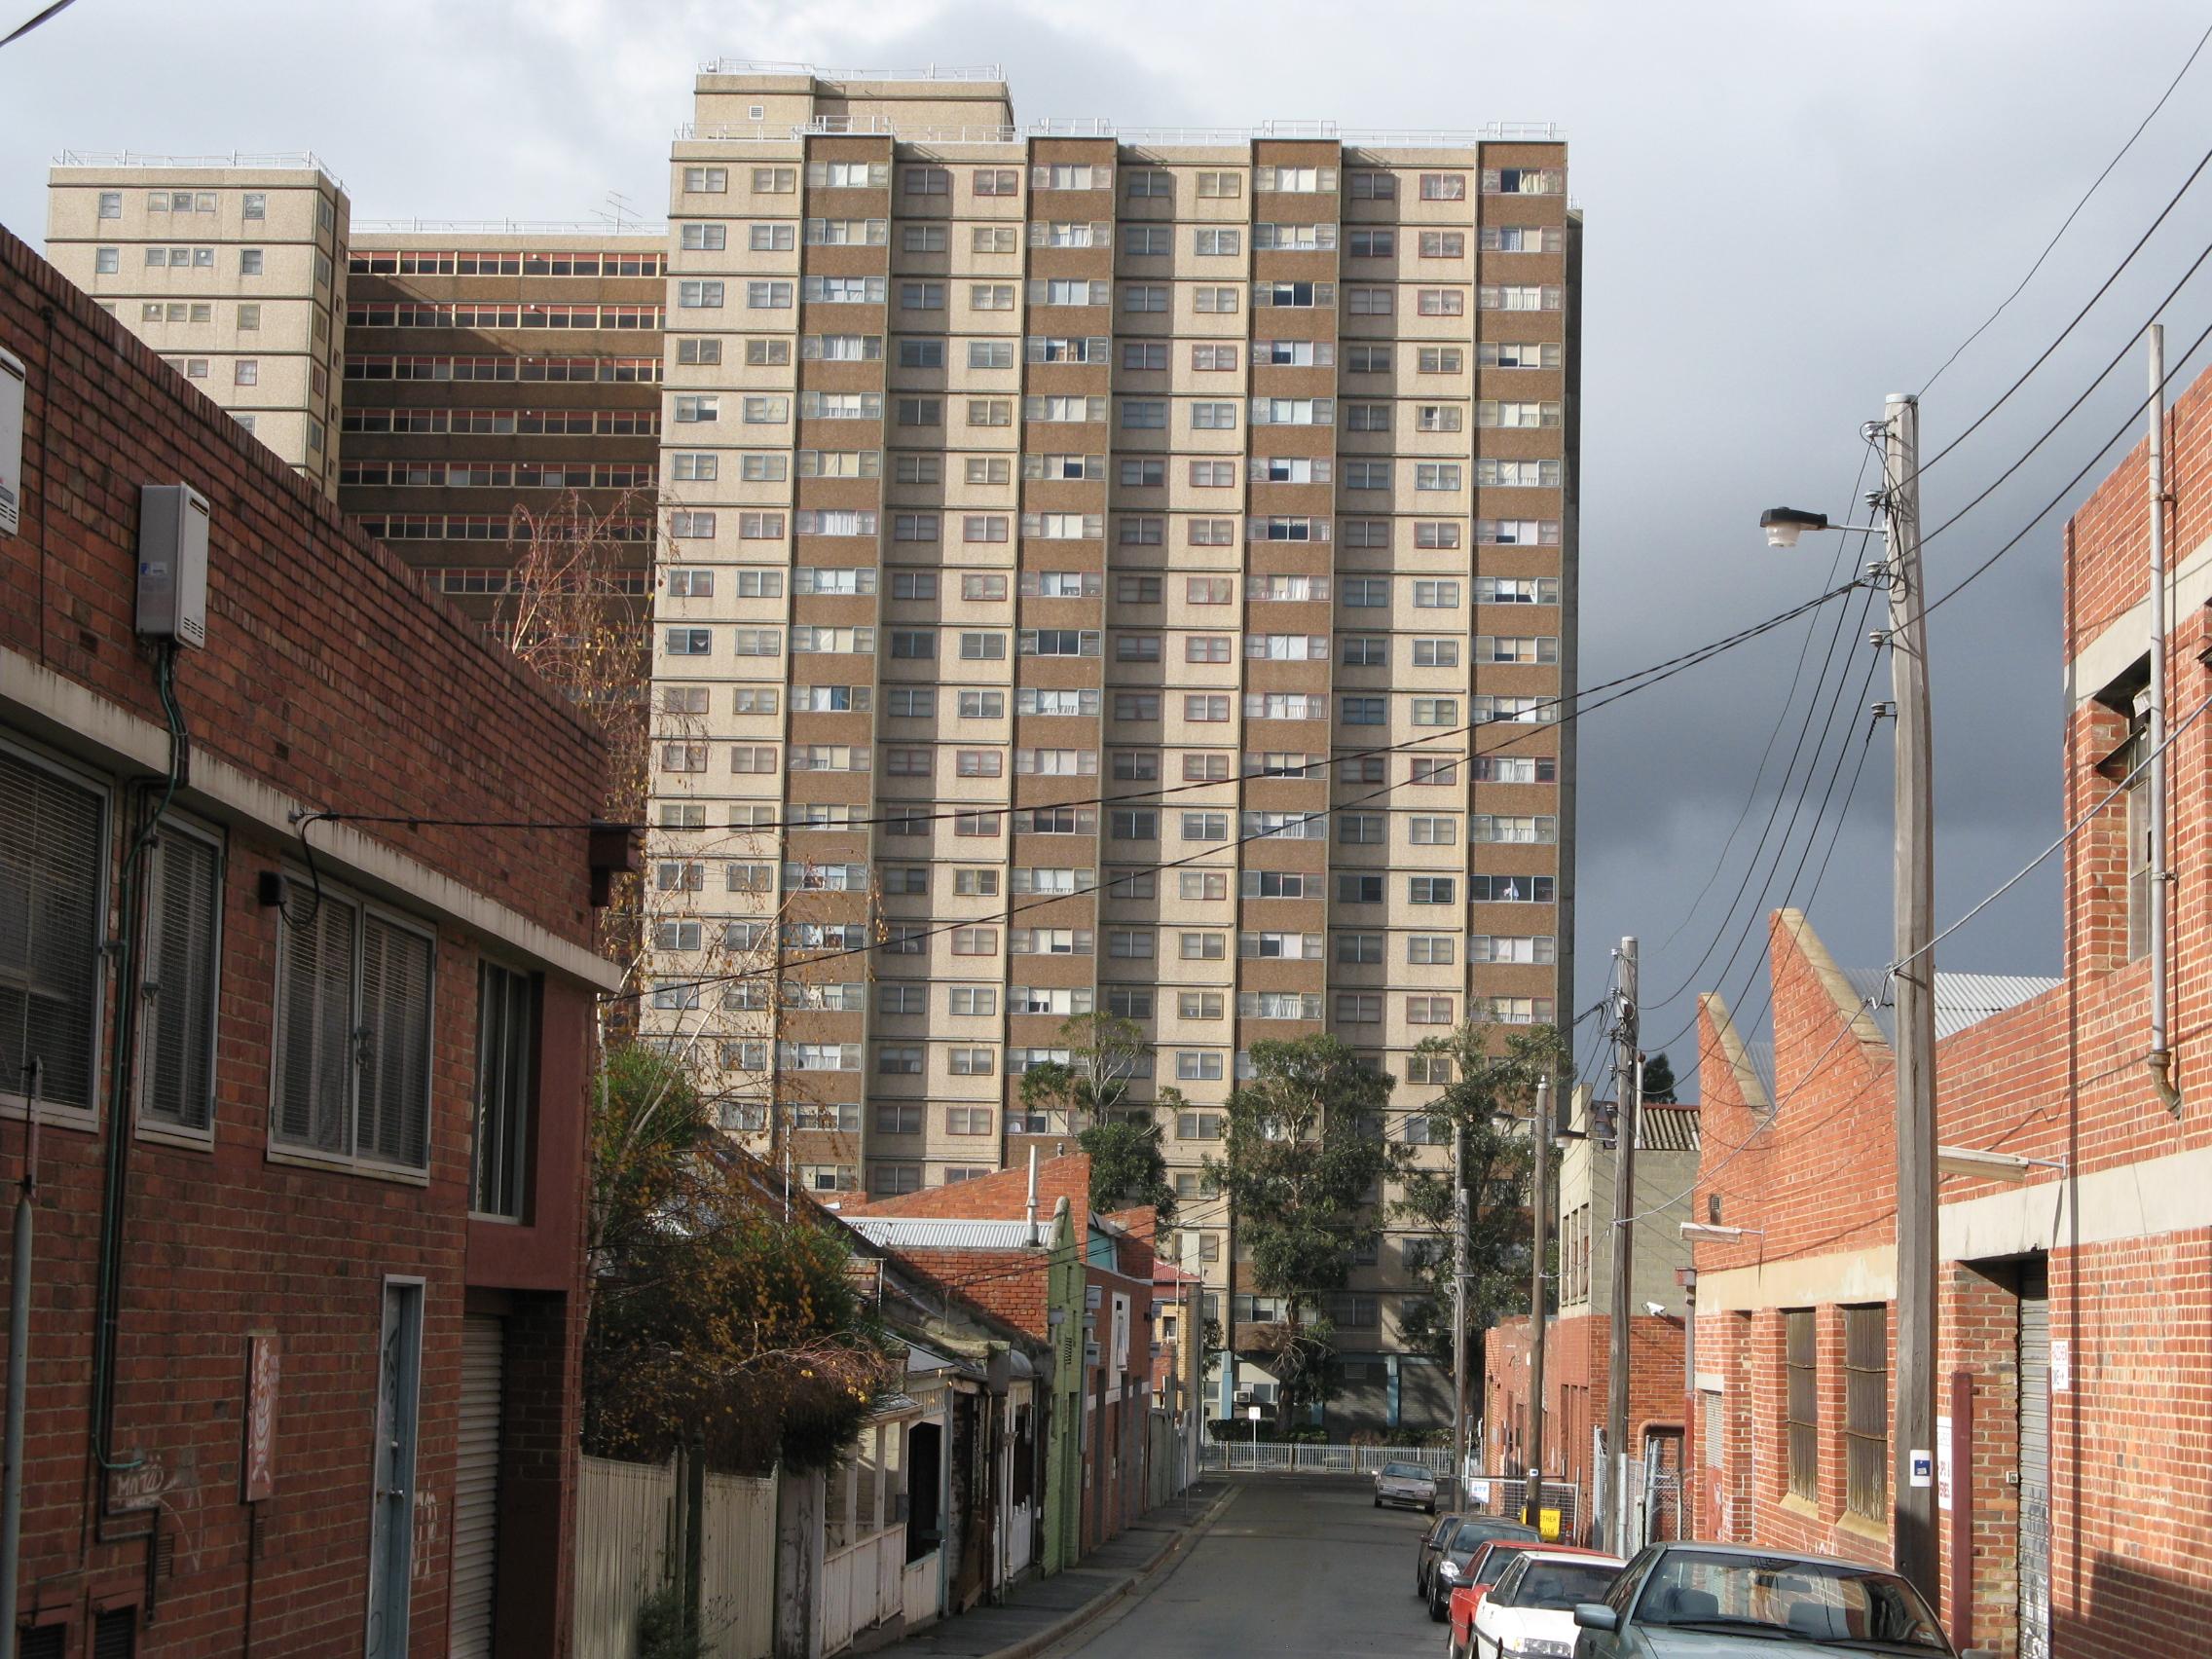 Public housing tower in Melbourne, Australia [2272x1704 ...